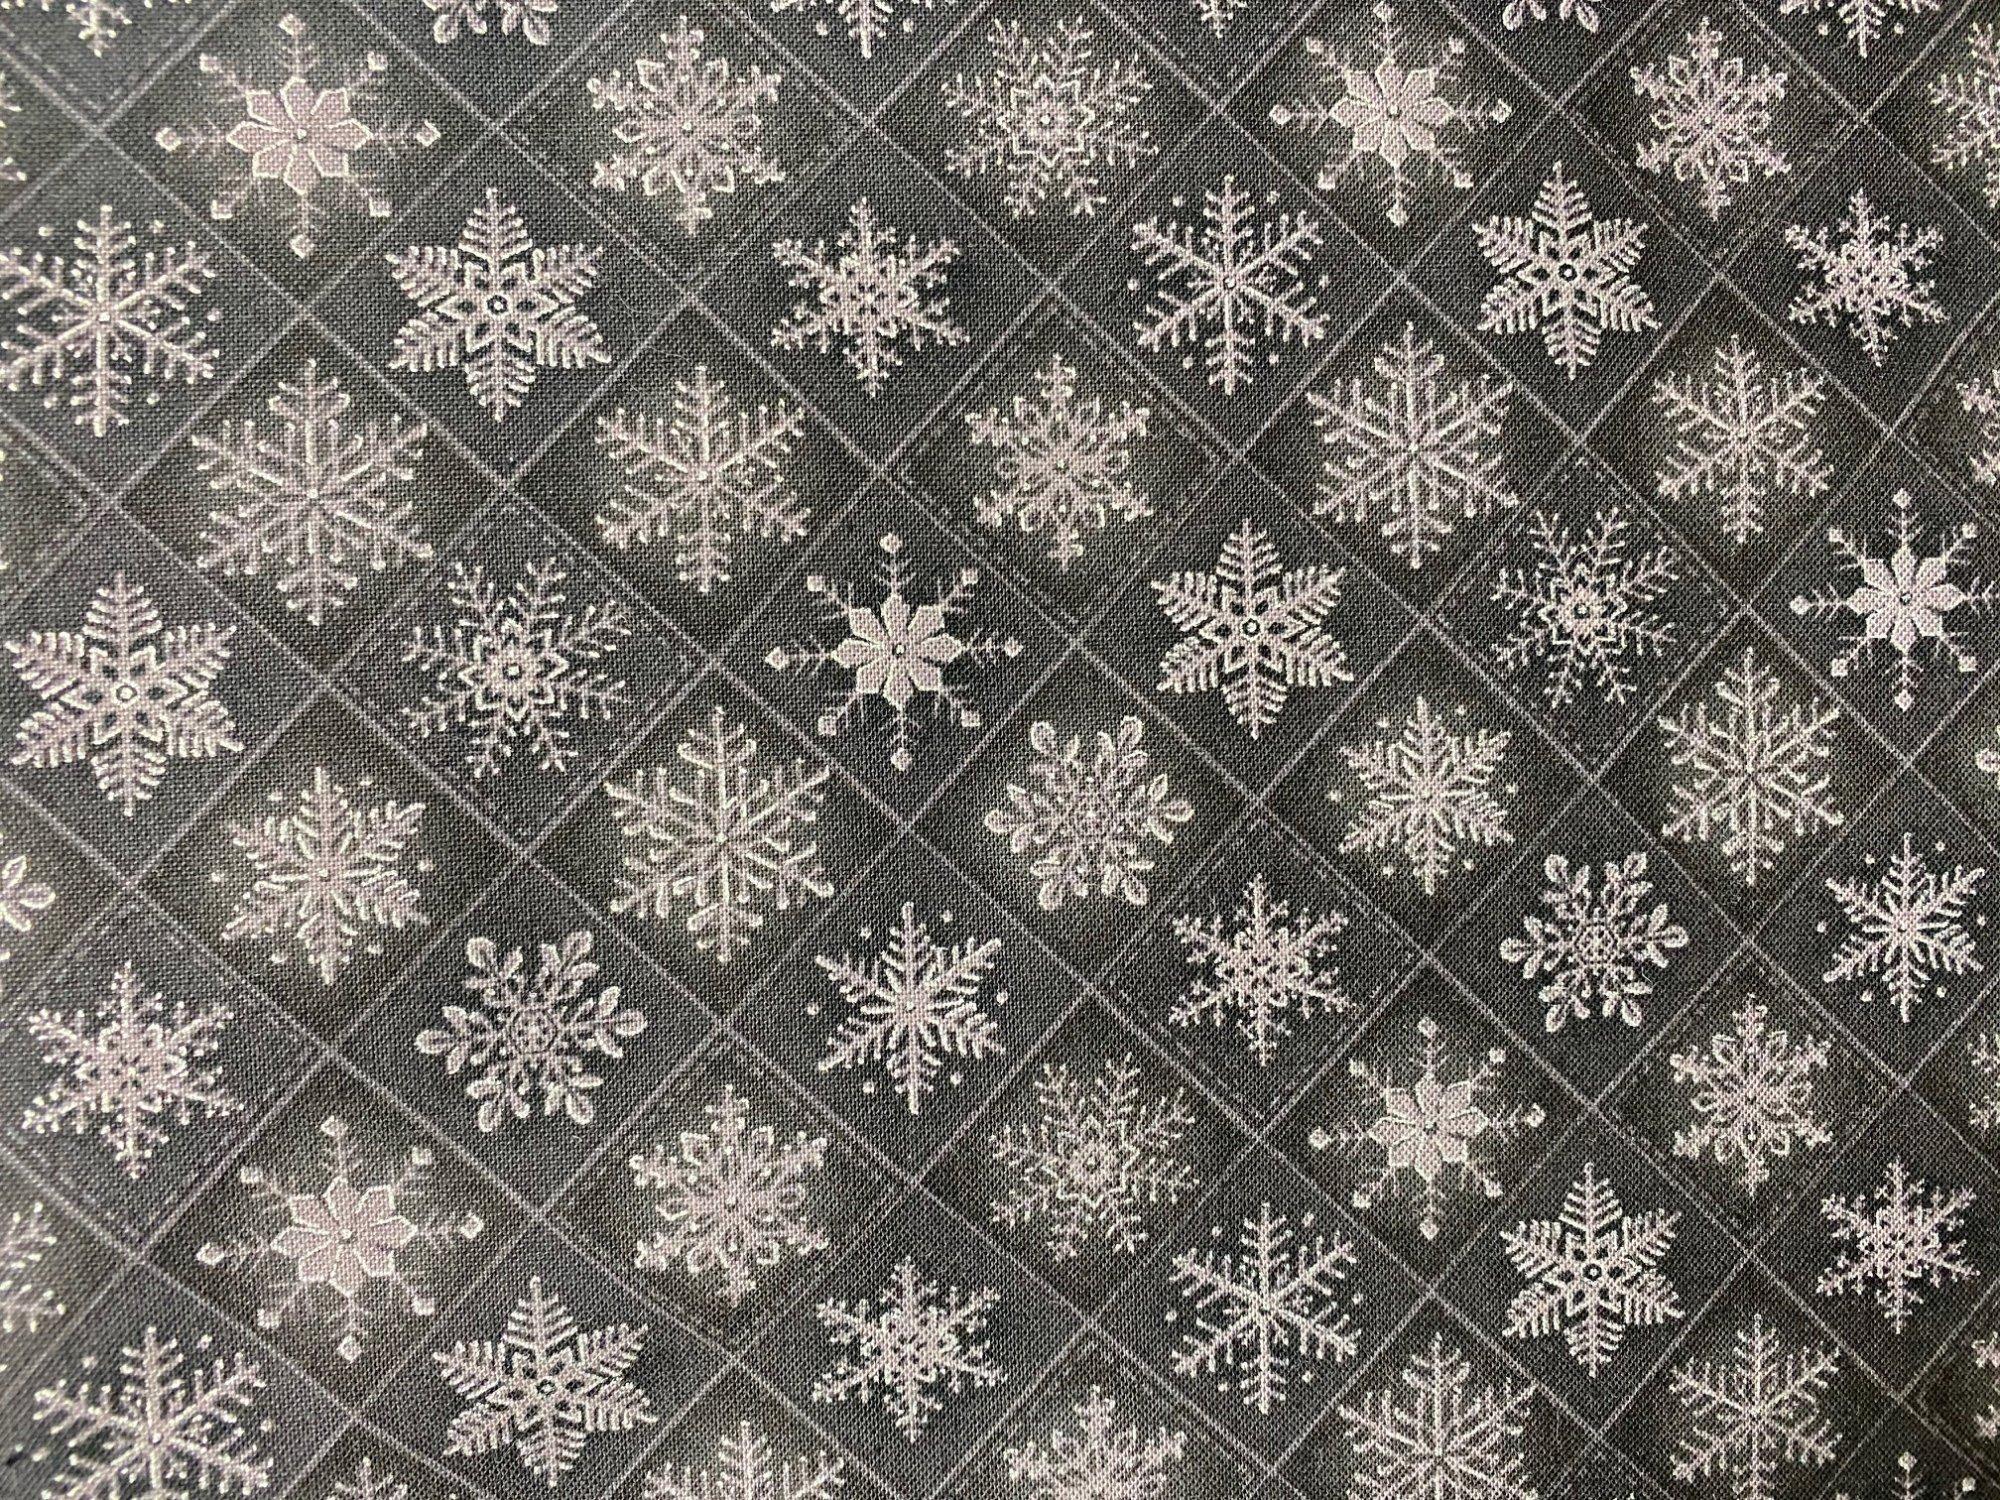 Choice Visions black/sliver snowflakes